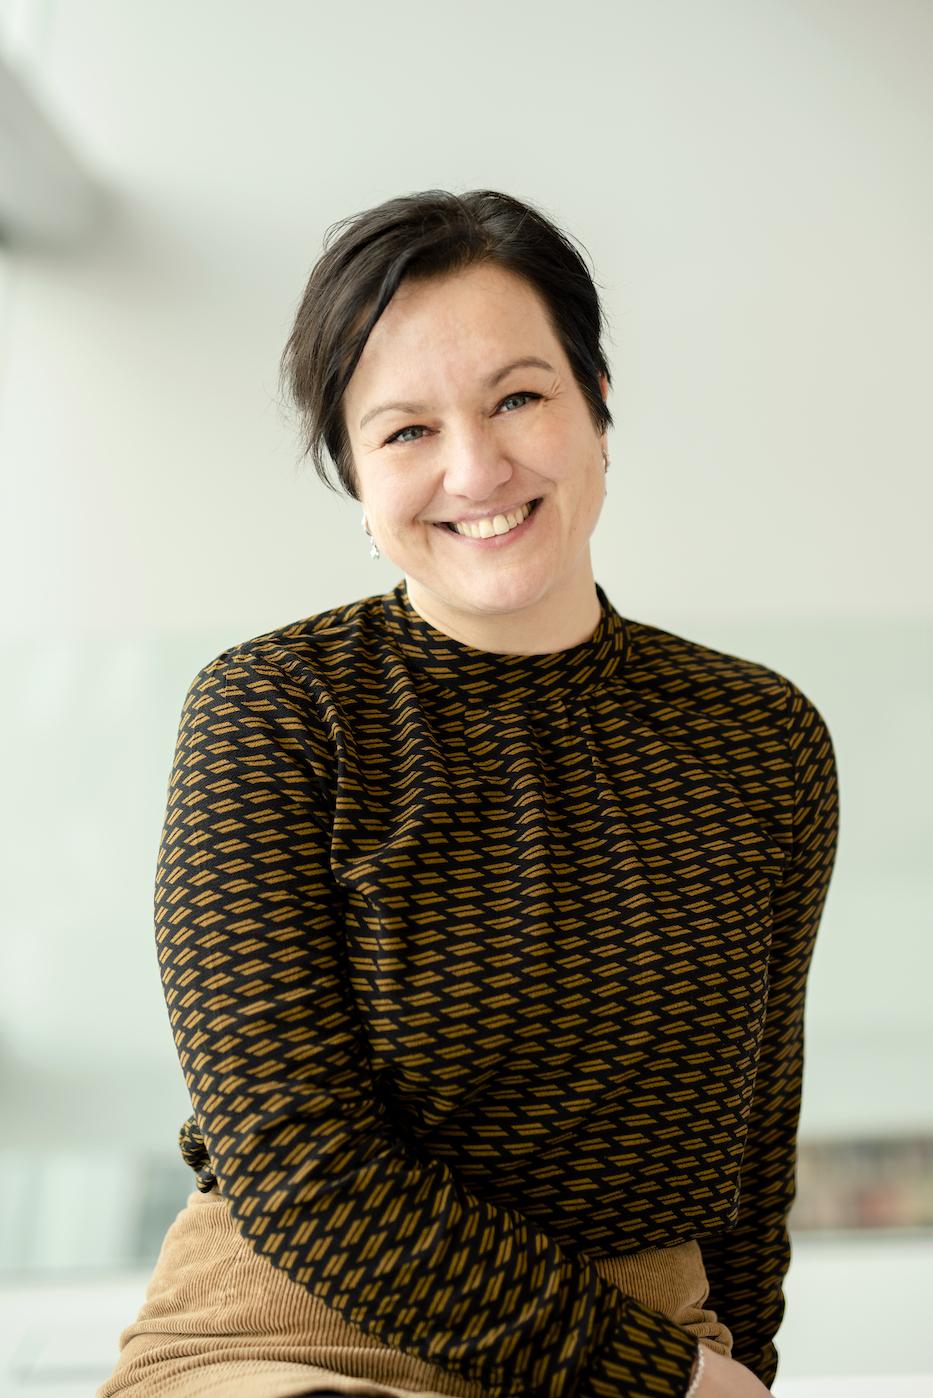 Anita Jakobs